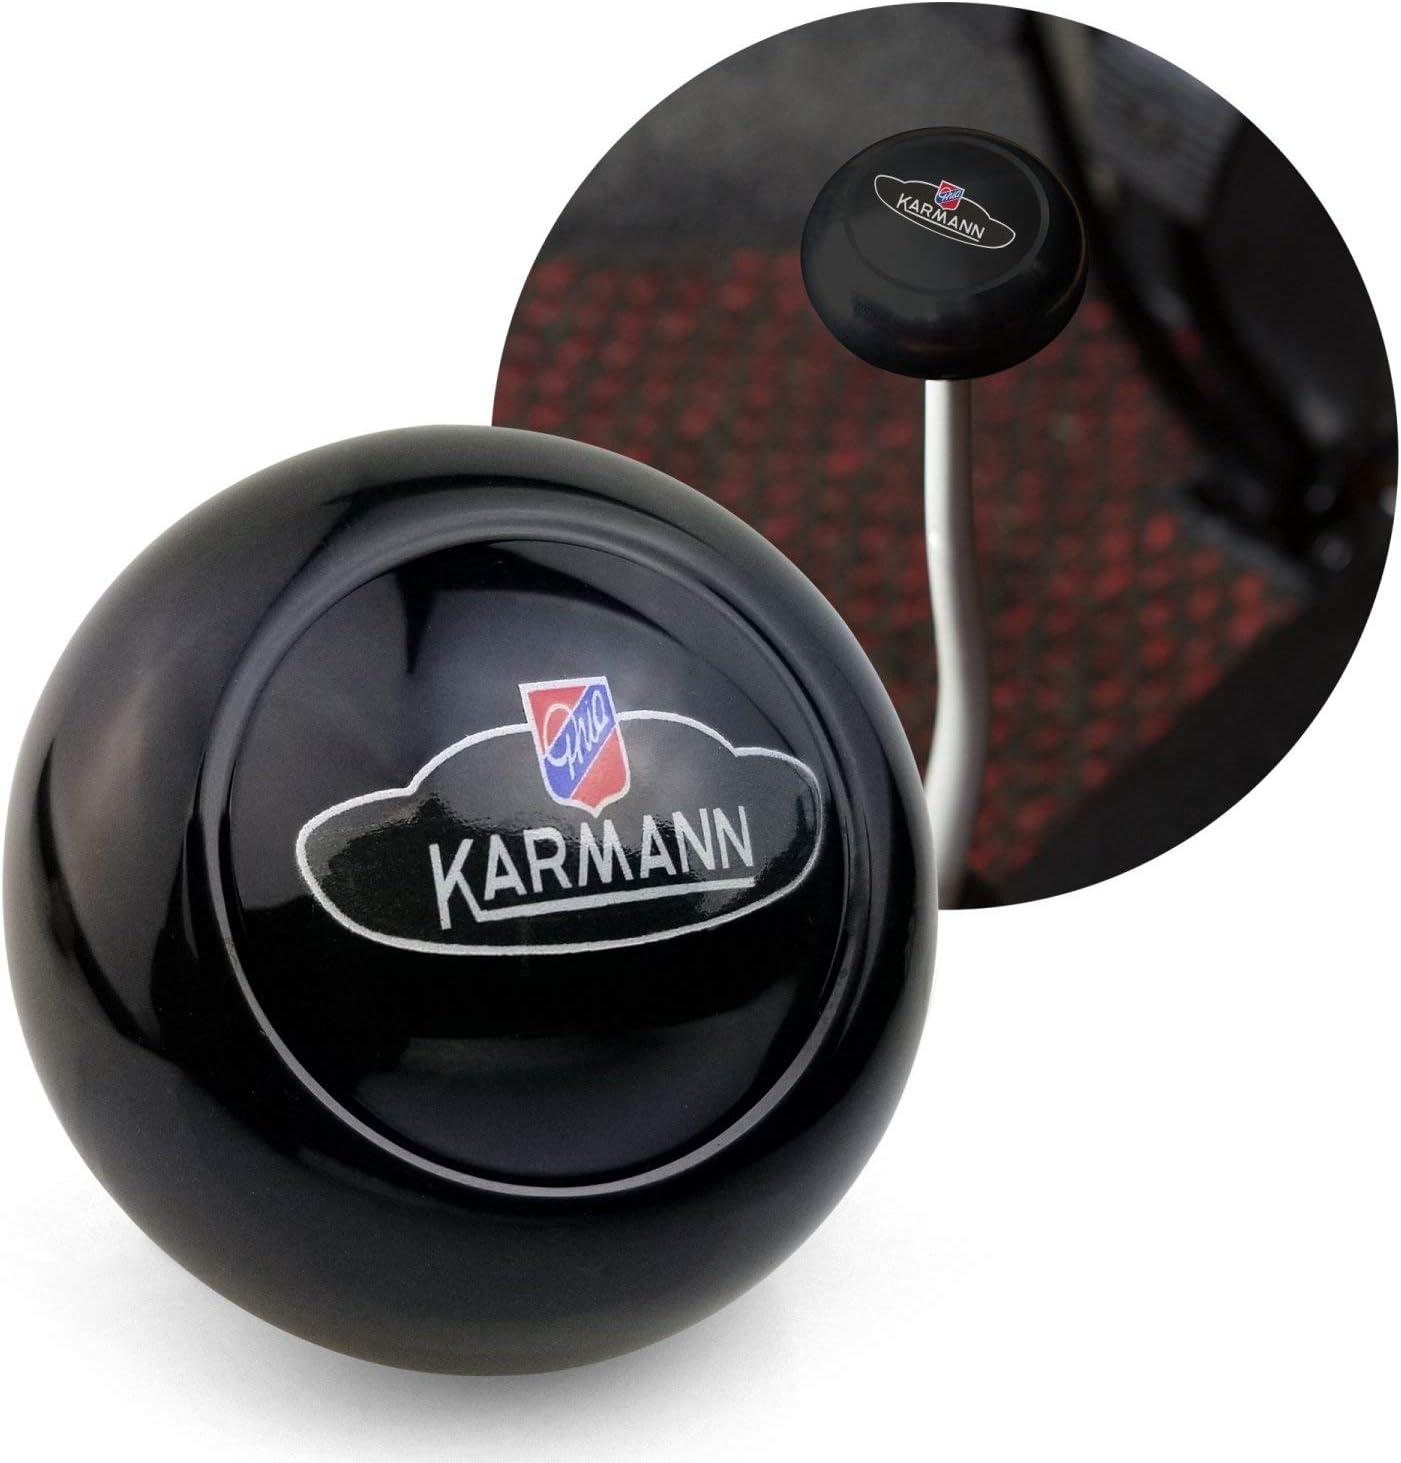 Kaferlab ZA788320 Karmann GHIA Crest Black Gear Shift Knob M10 for Volkswagen Sedan /& Vert